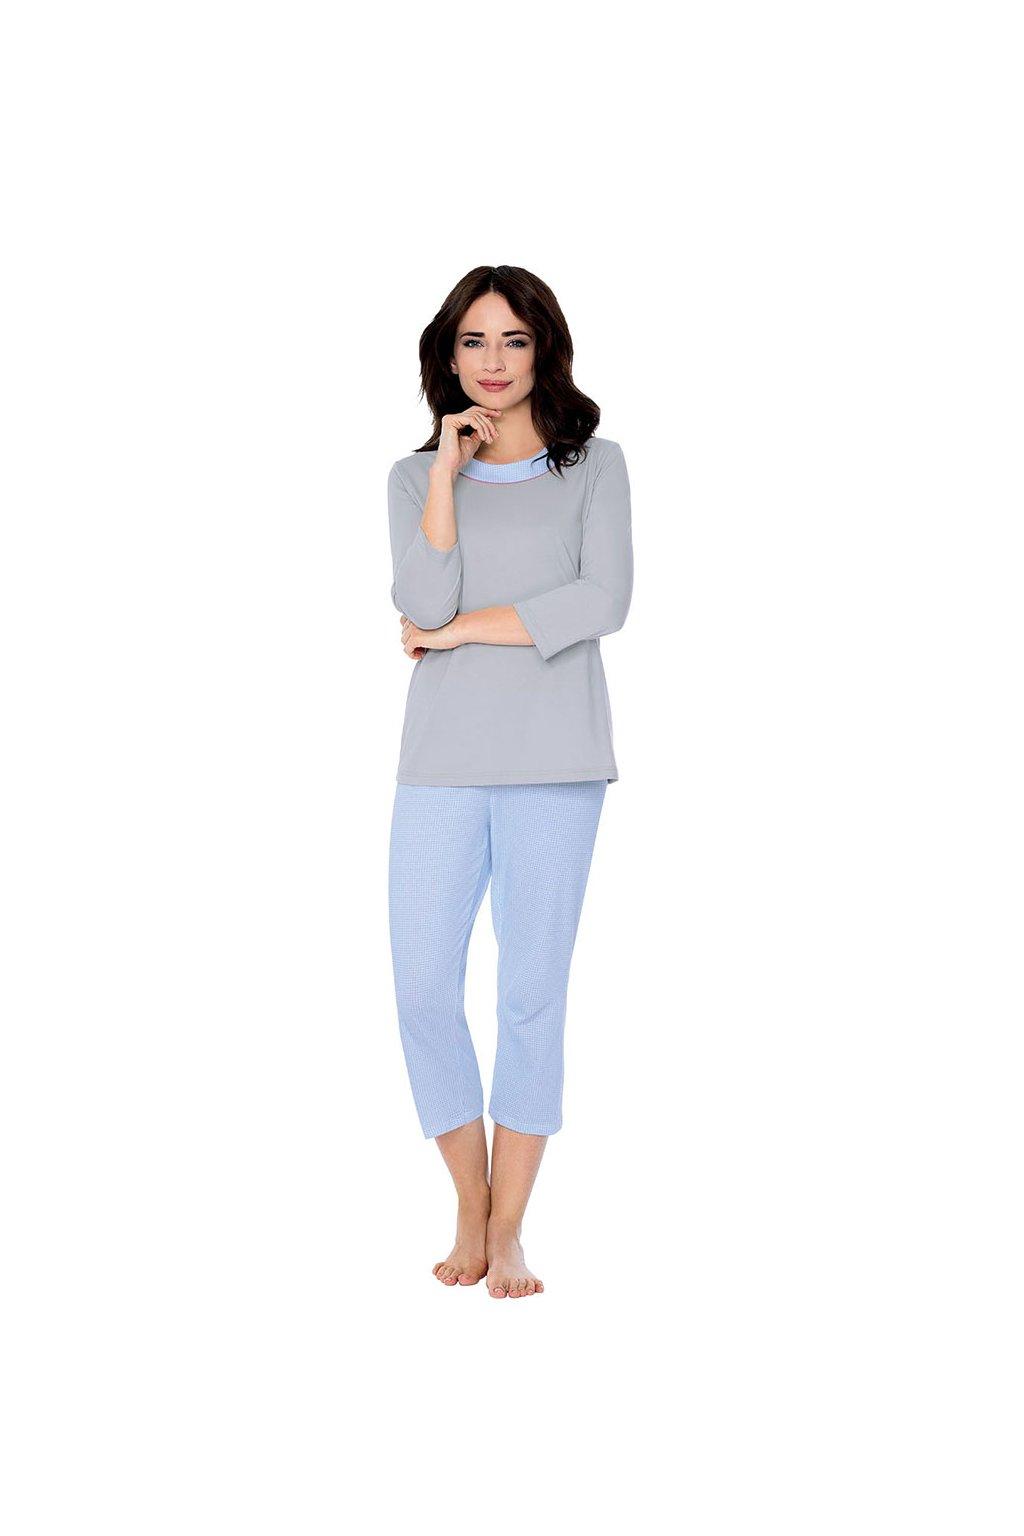 Dámské pyžamo s 3/4 rukávem, 104492 271, šedá